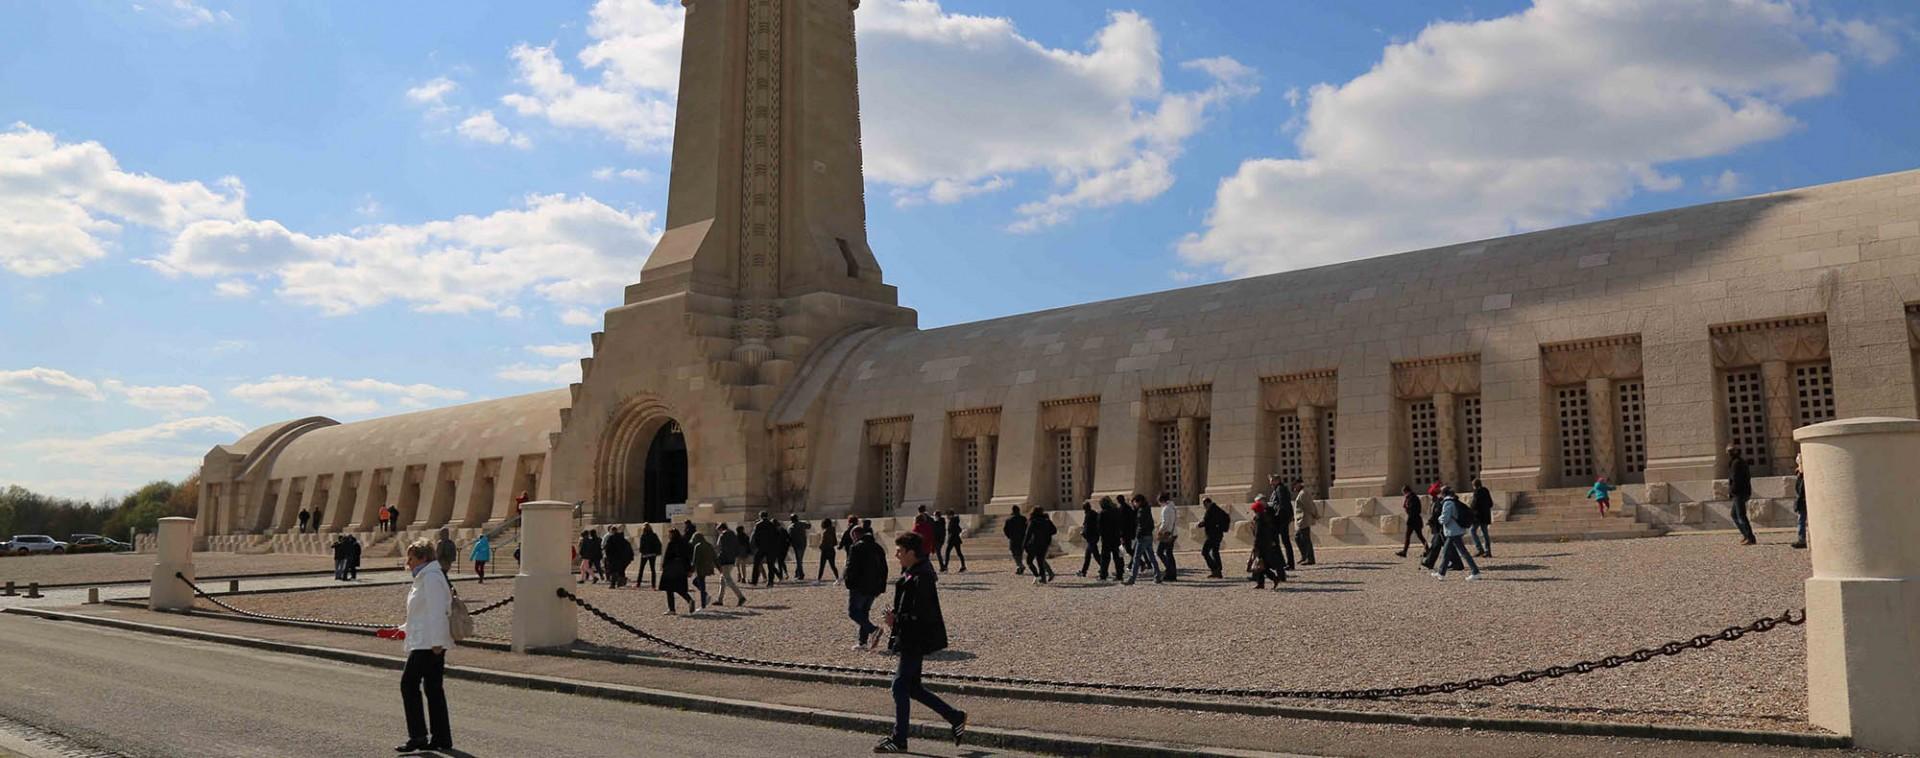 Destination France - Land of Memory | © CTQ-TGV